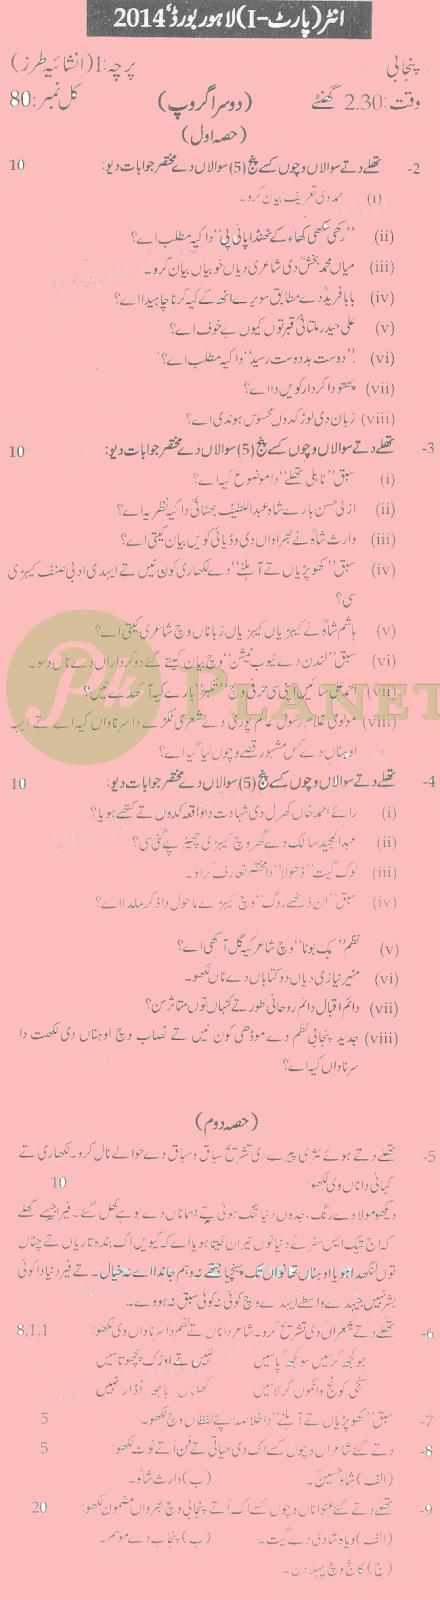 Past Papers of Punjabi Inter part 1 Lahore Board 2014